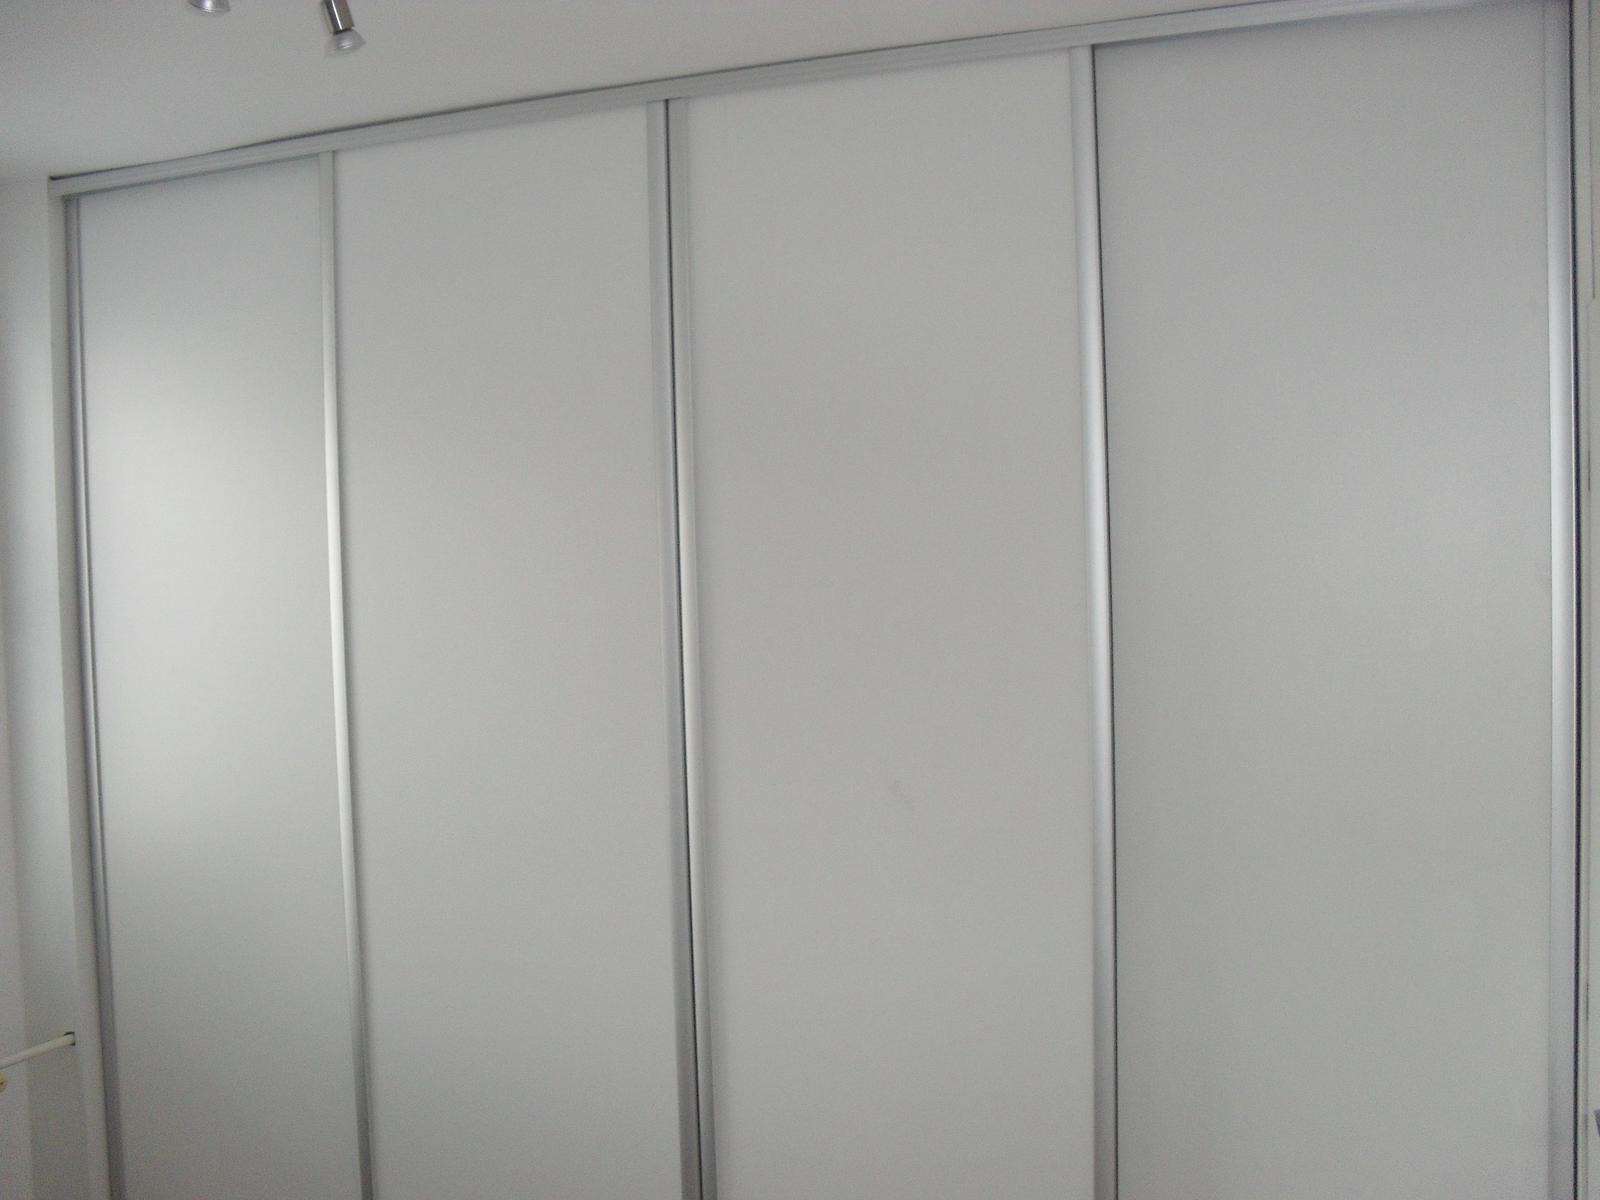 Vstavané skrine Martin Benko Bošany - Obrázok č. 72